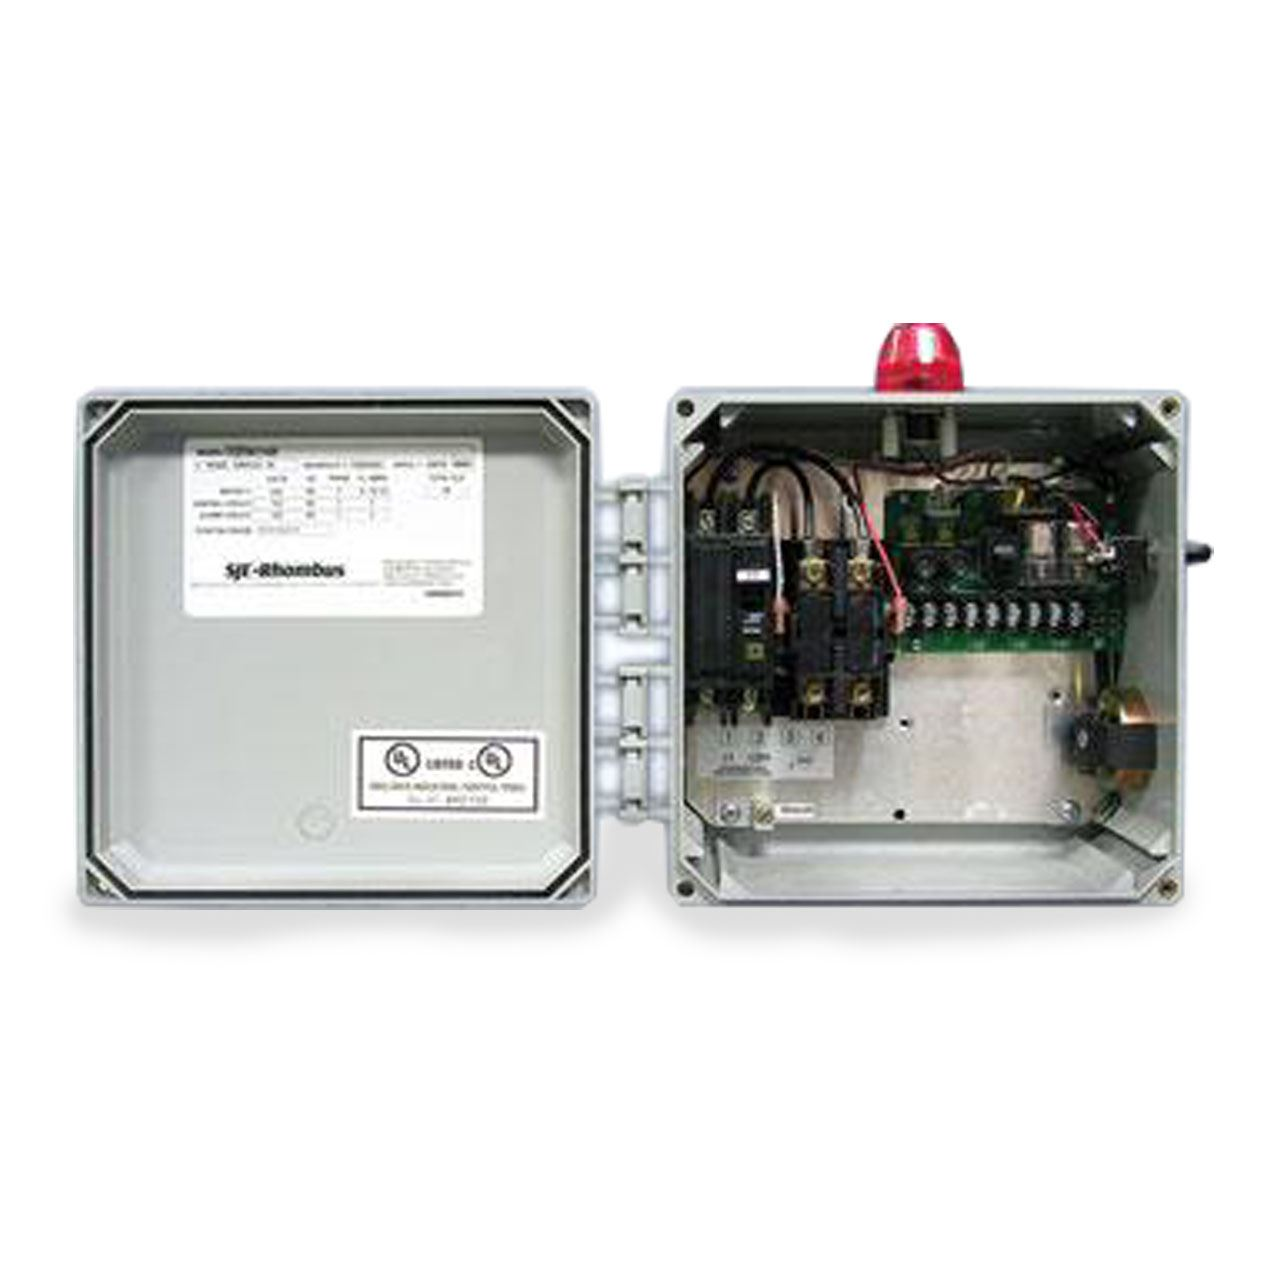 Fasco D729 Wiring Diagram Auto Electrical Garmin 5212 Chartplotter Marine Fuel